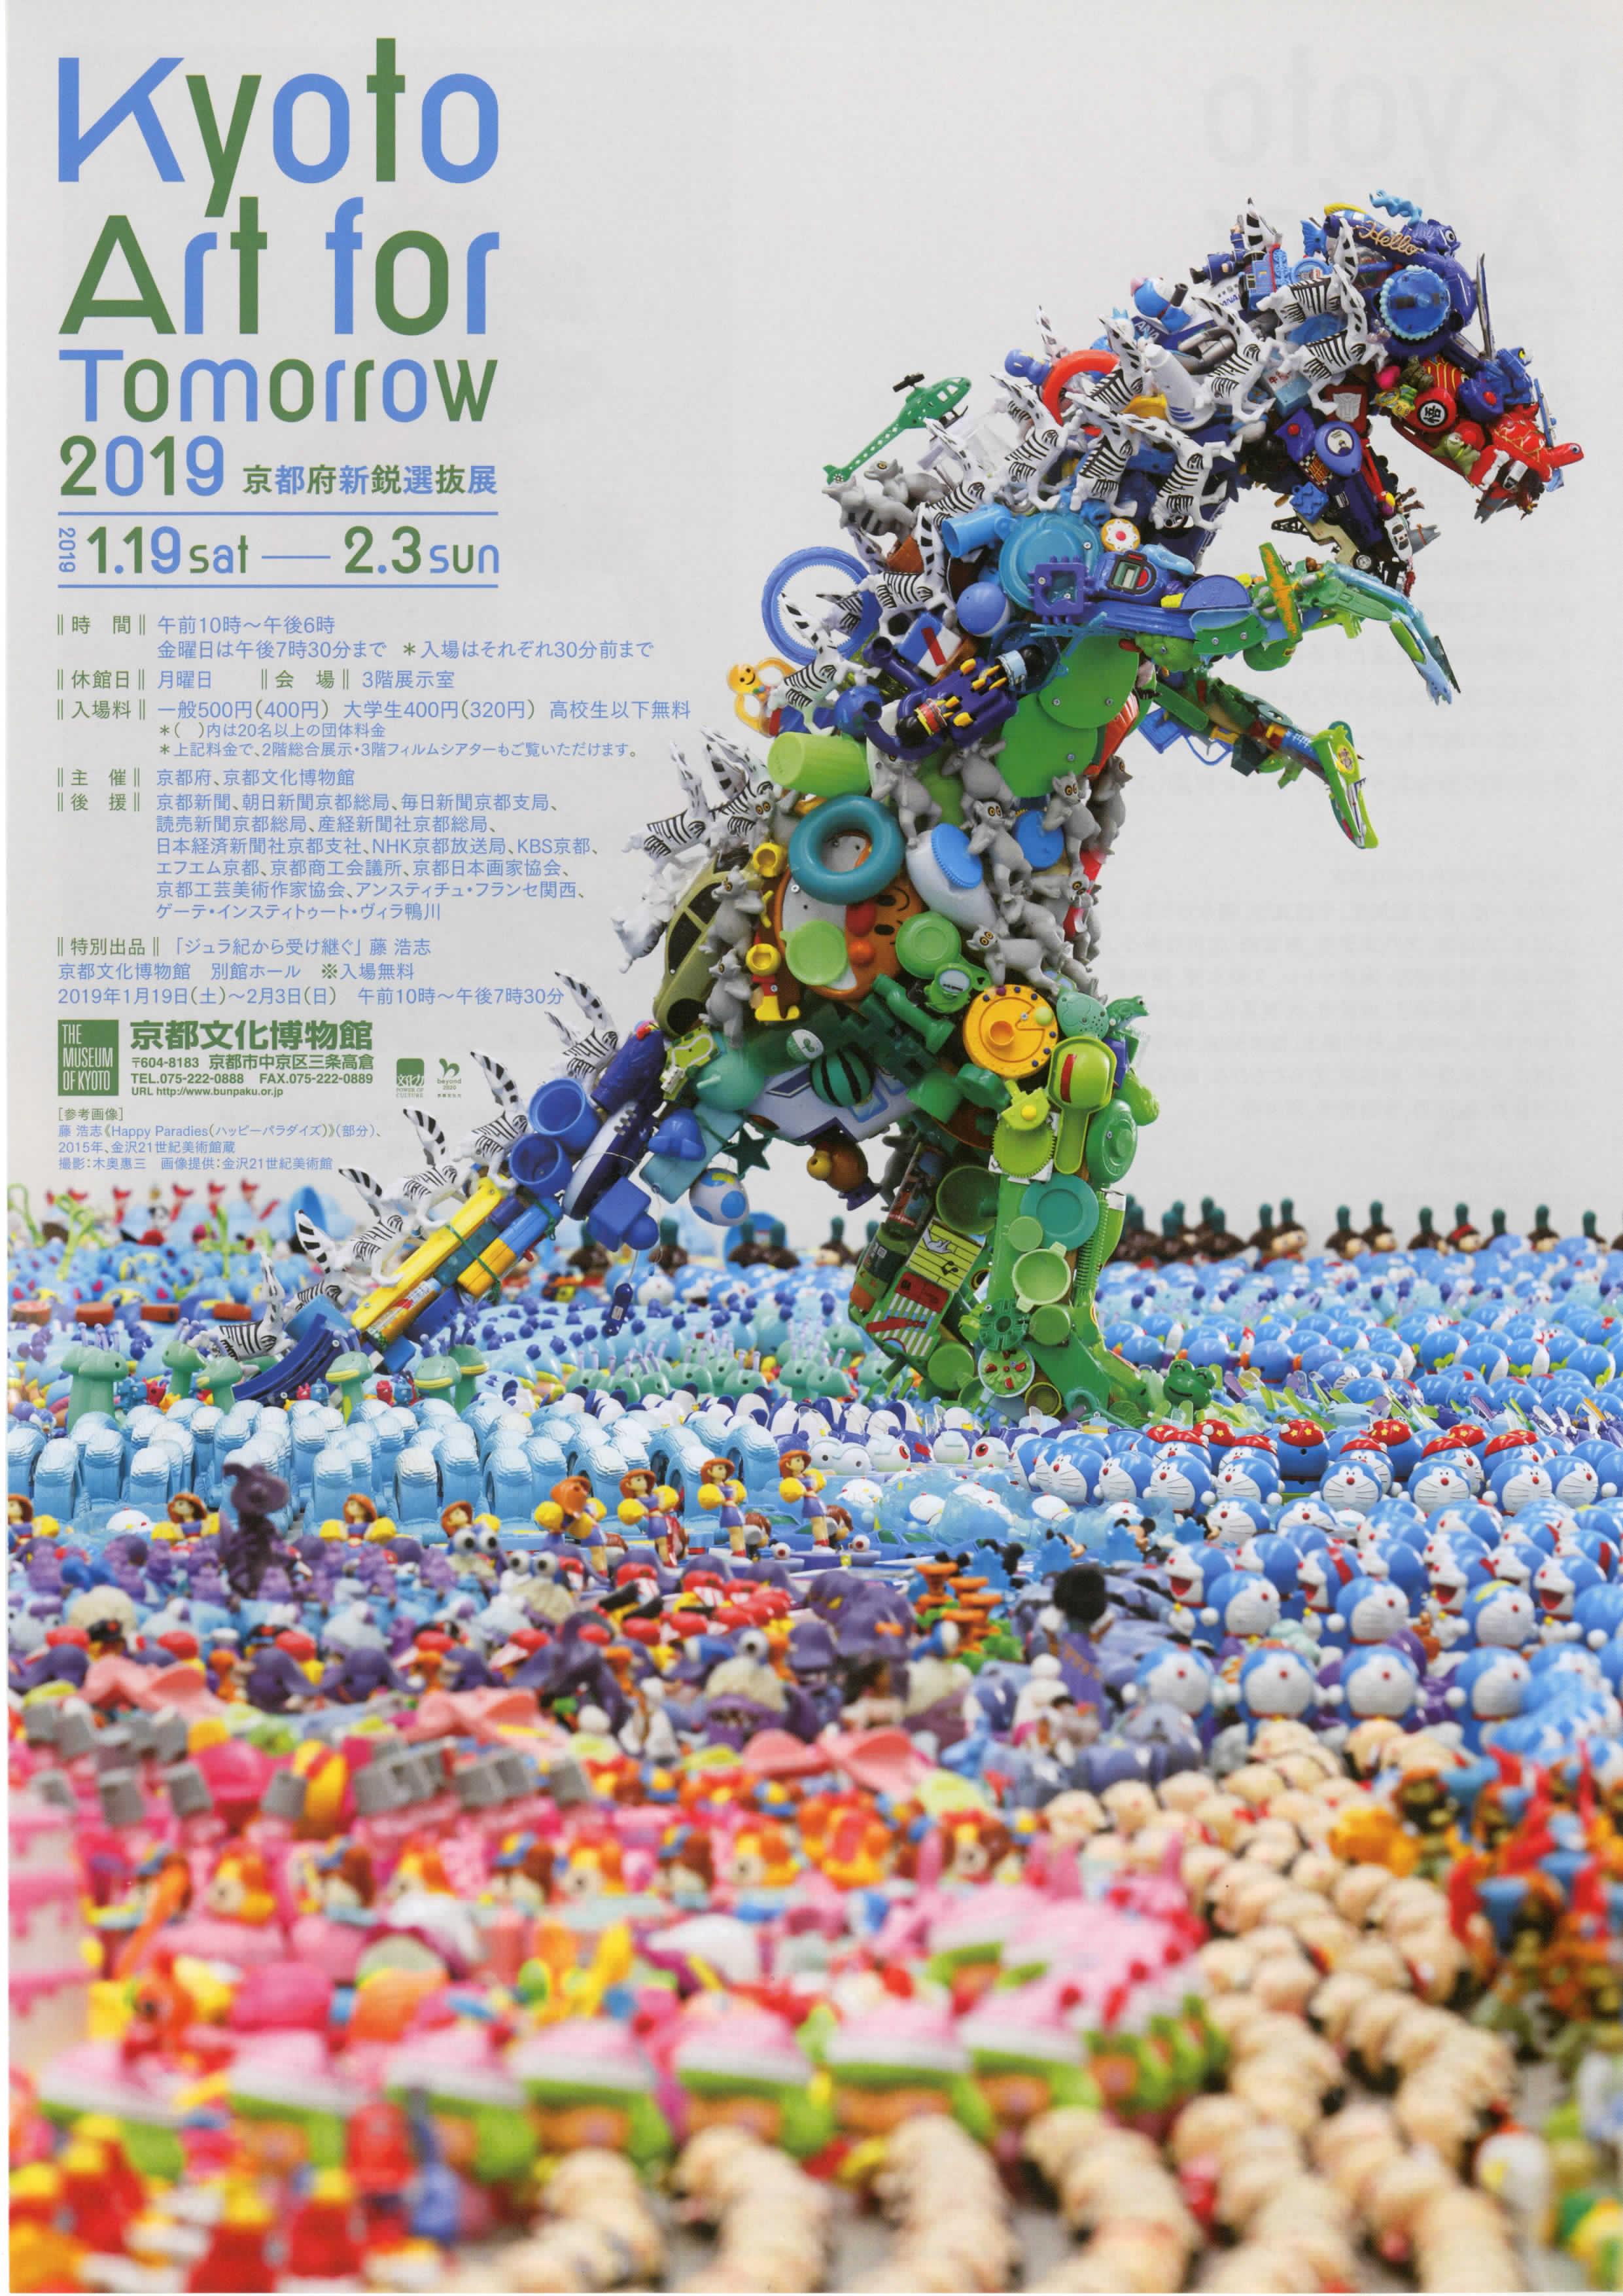 Kyoto Art for Tomorrow 2019 ―京都府新鋭選抜展―